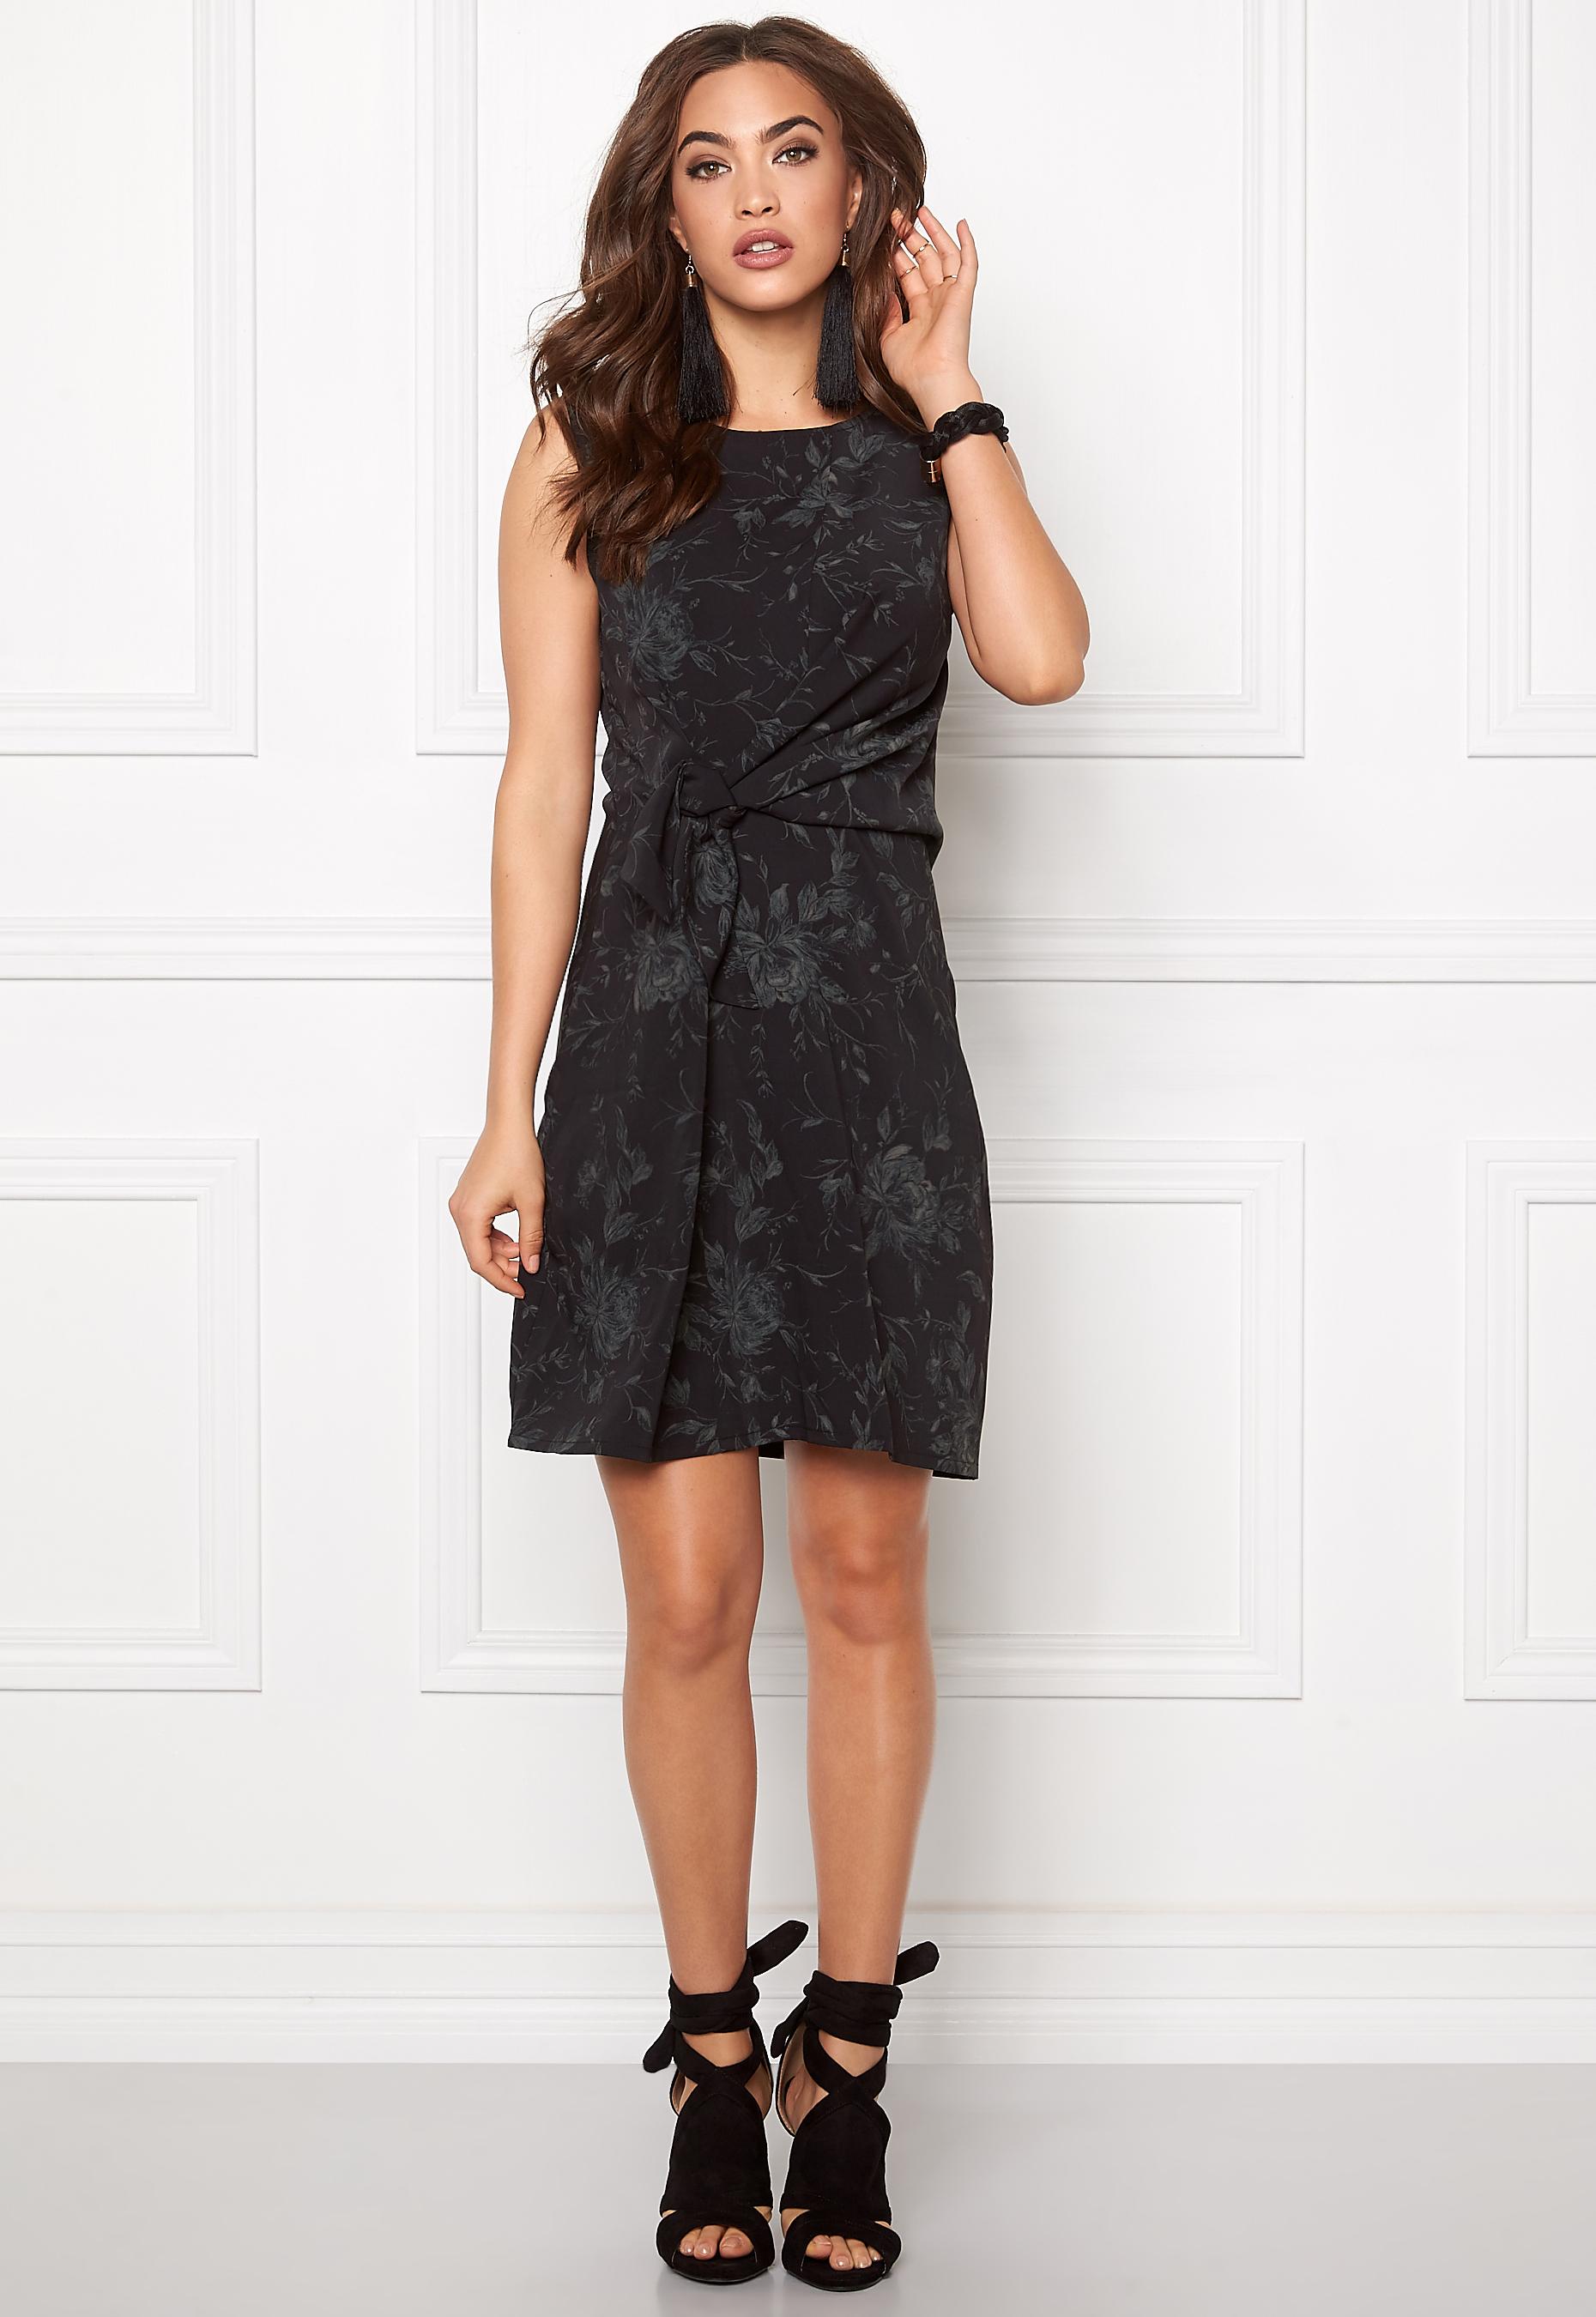 11a43a3b402c Make Way Willow Dress Black / Green / Patterned - Bubbleroom